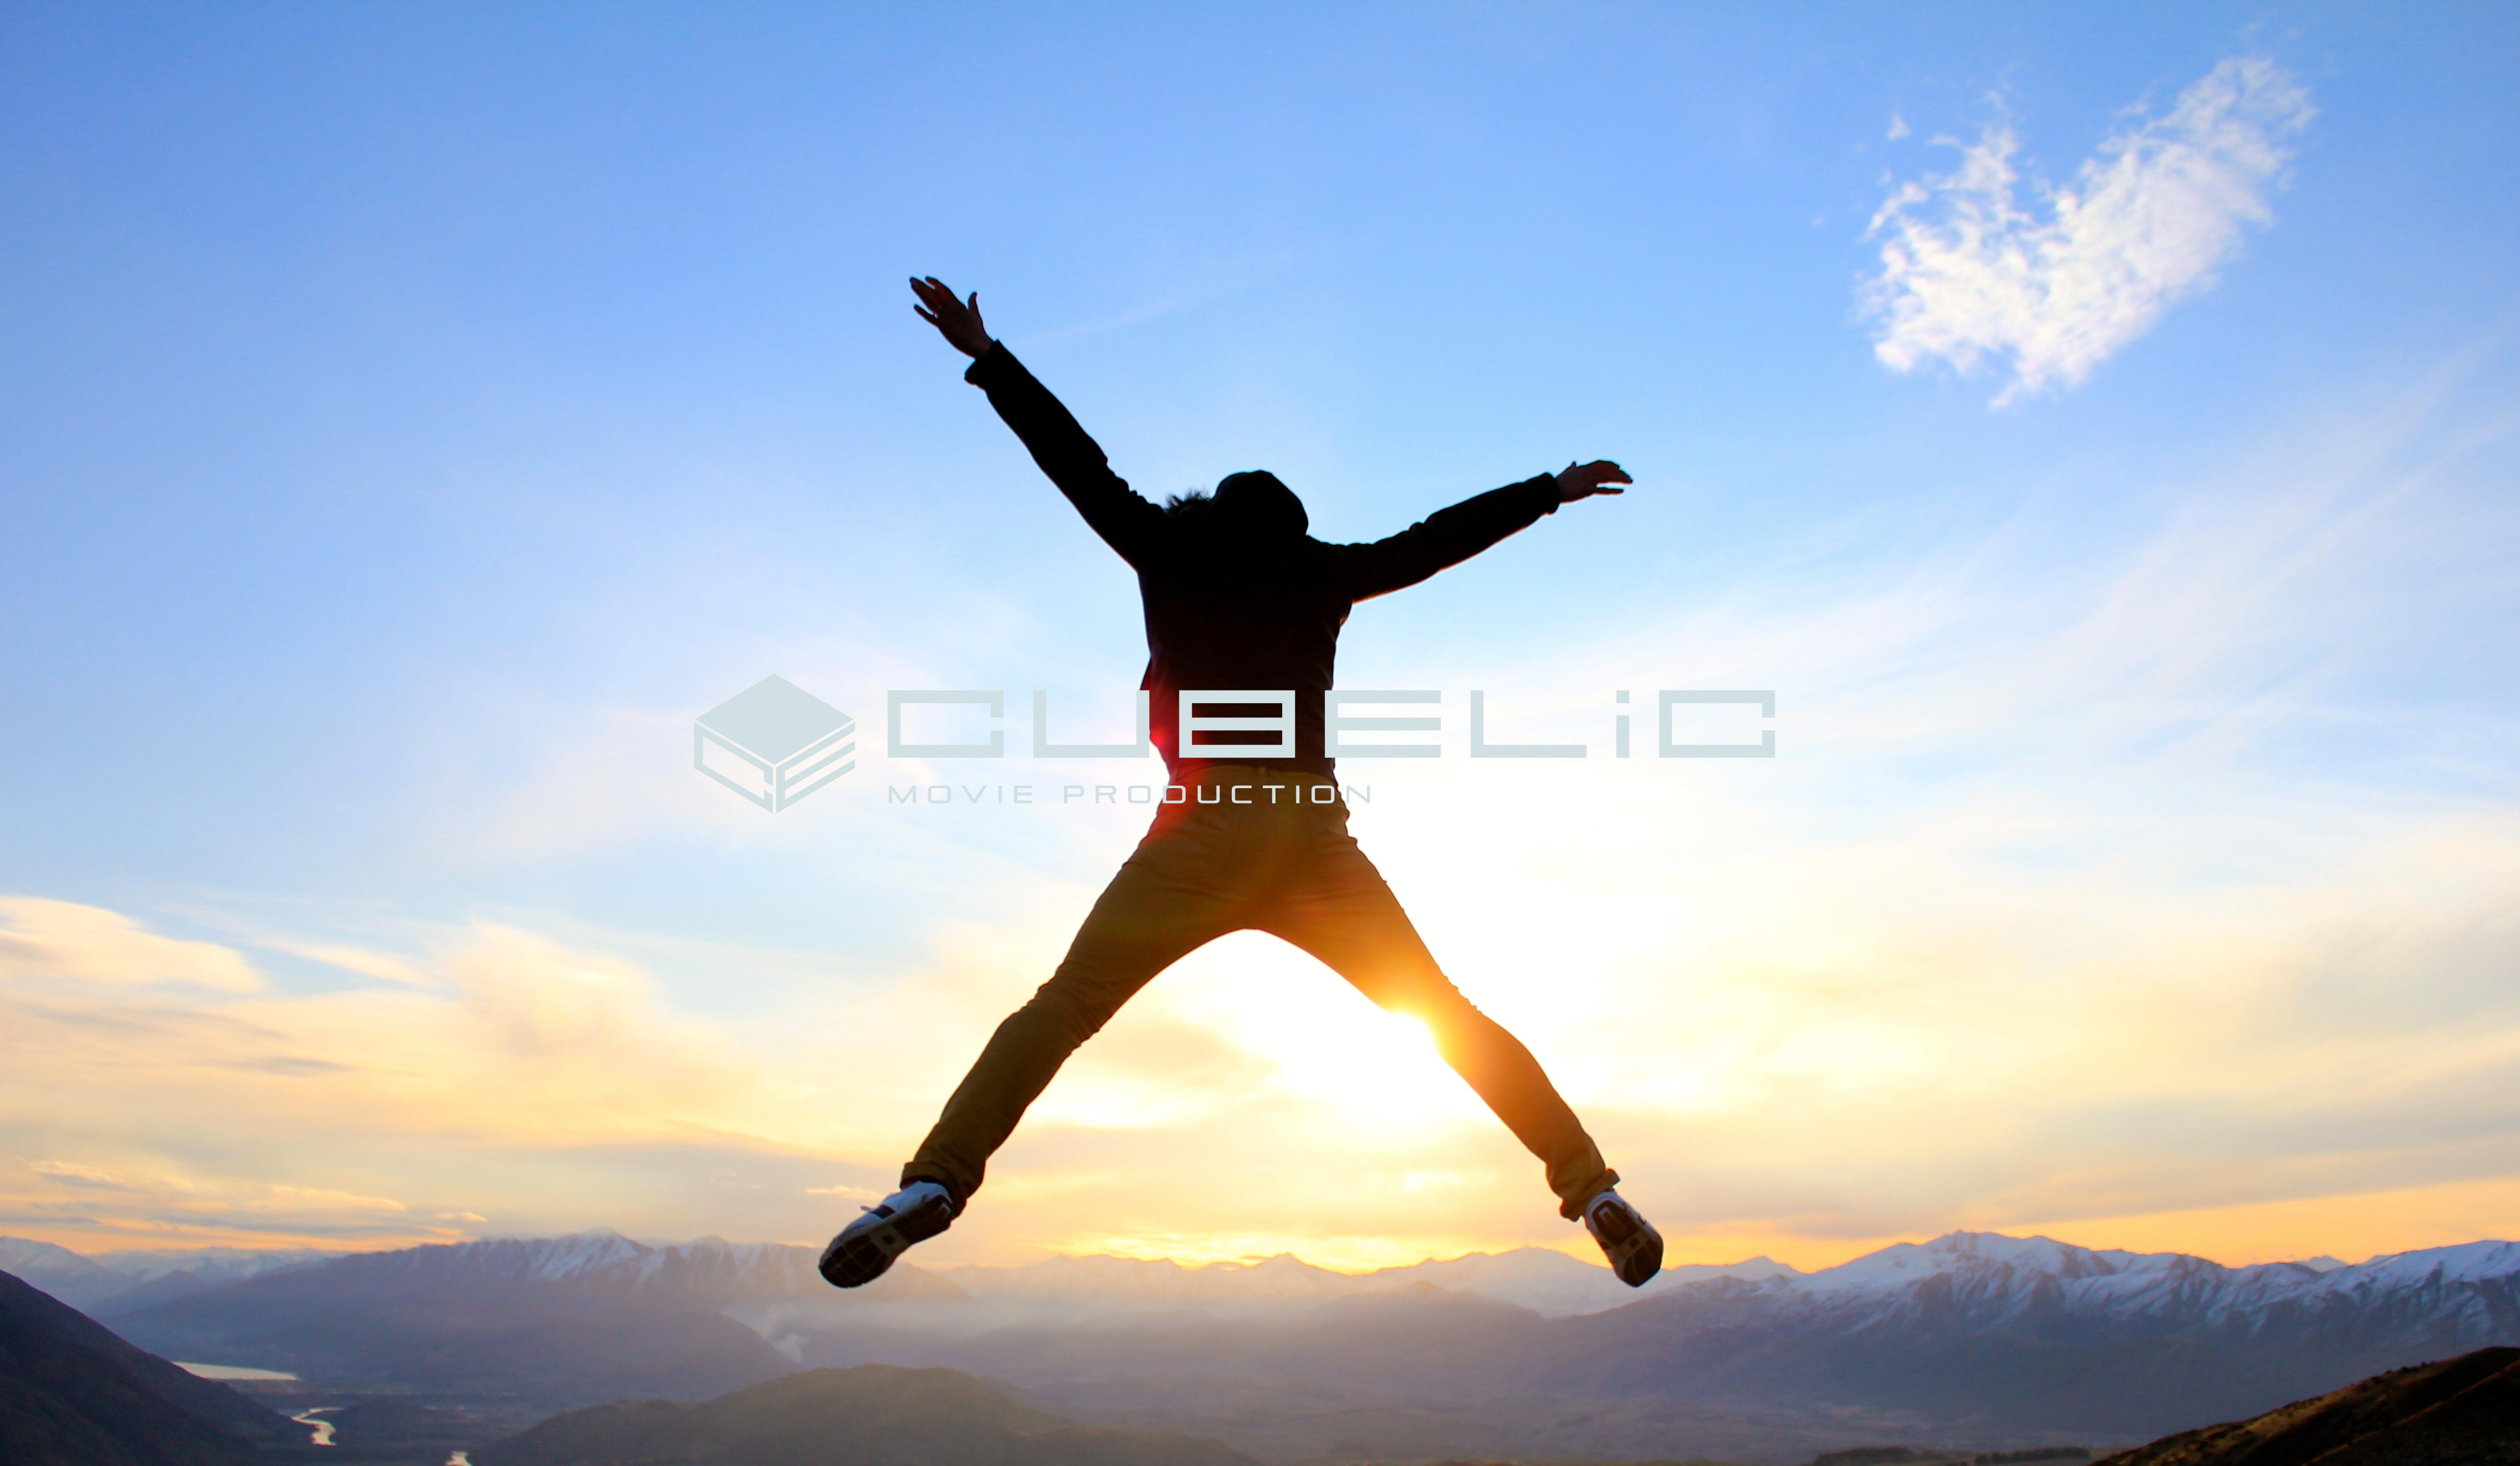 CUBELiC1501